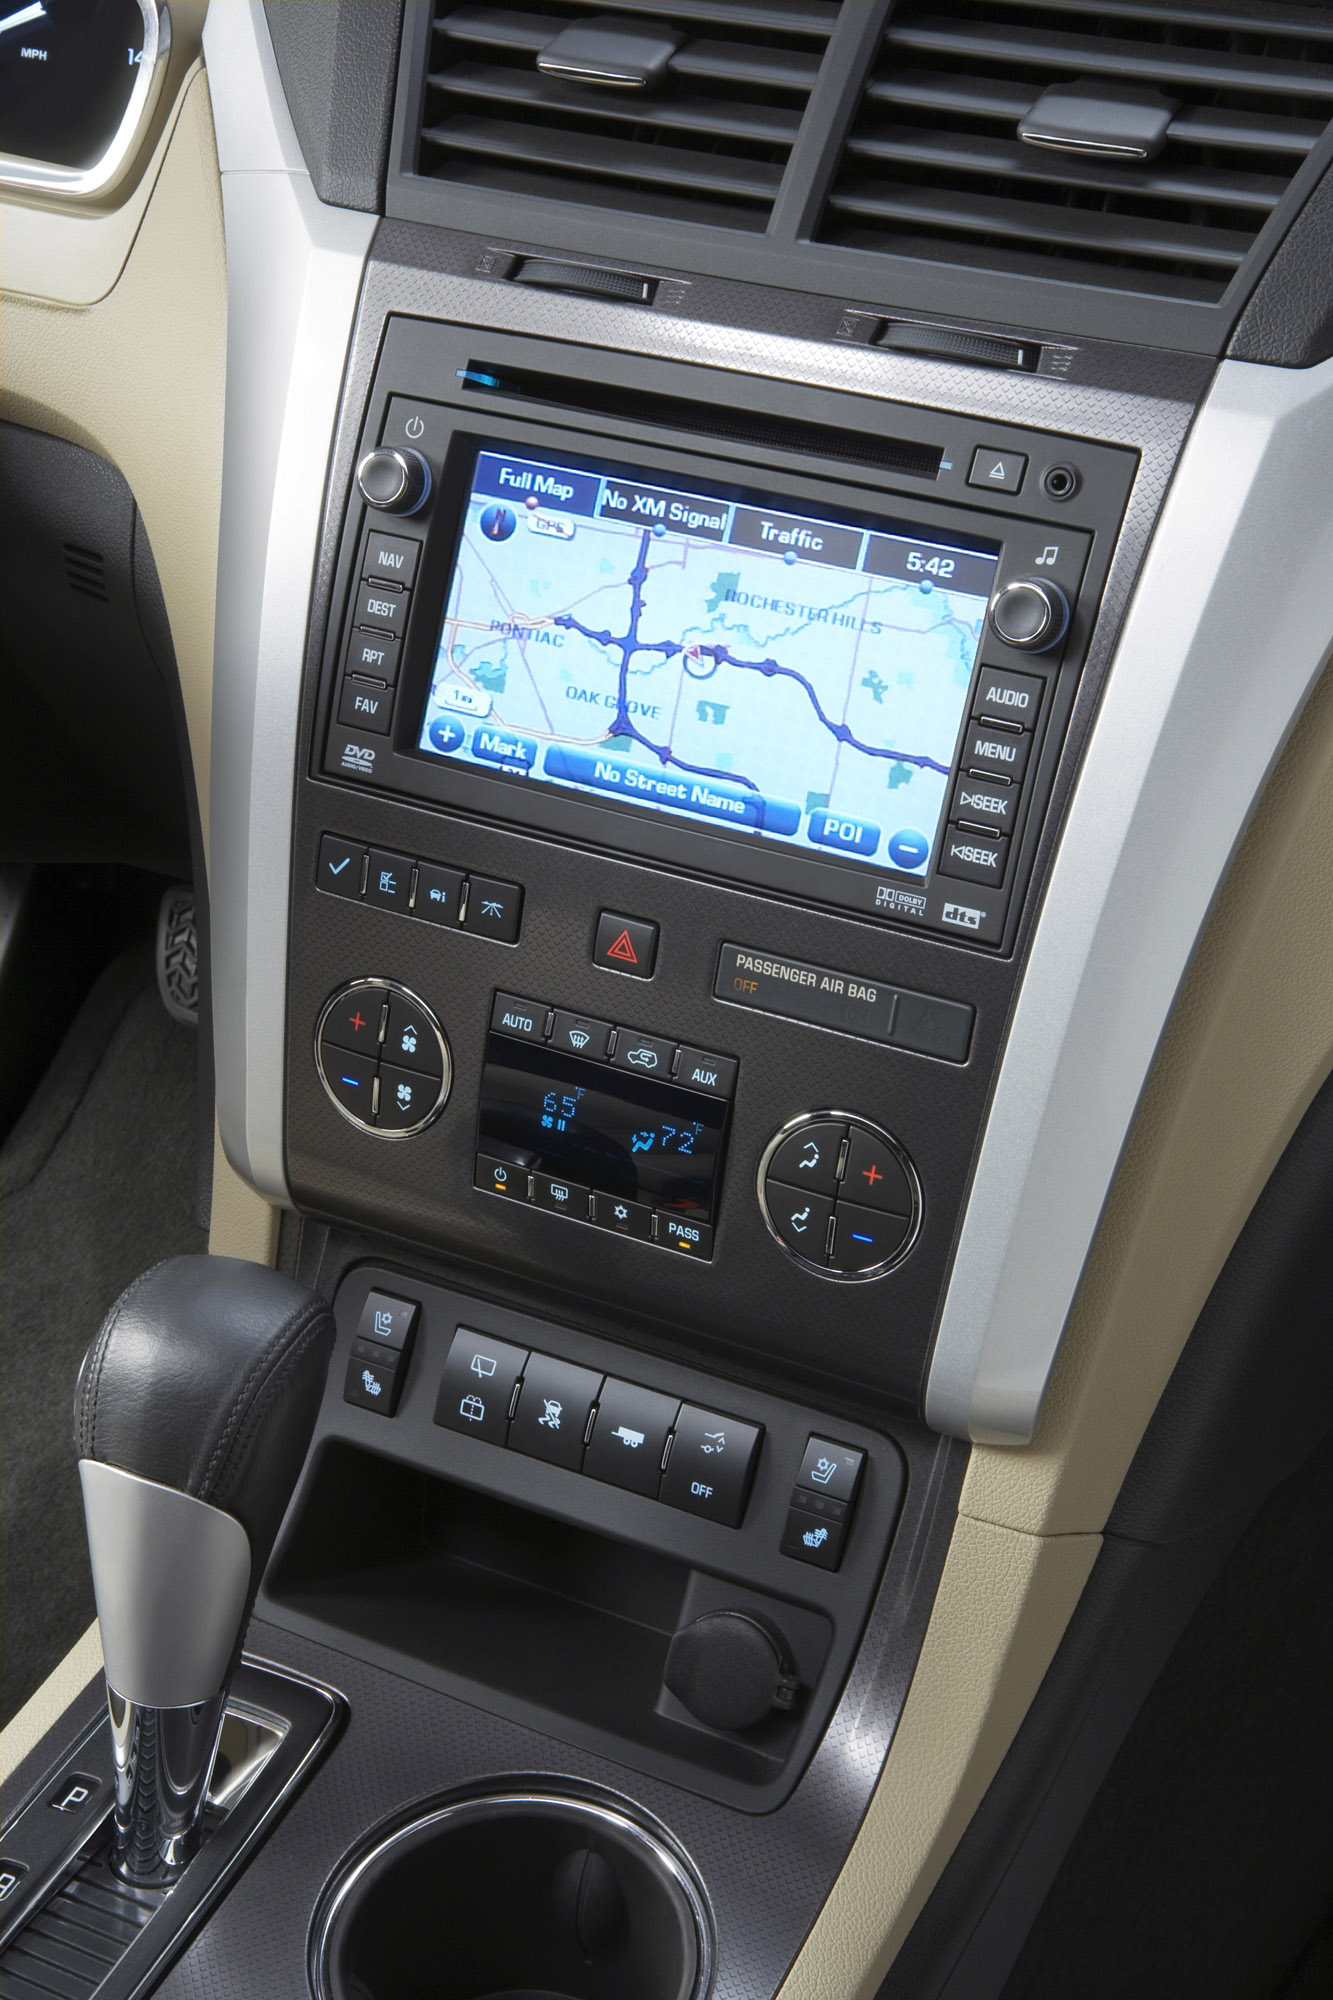 Chevrolet Traverse 2009 - Picture 16925